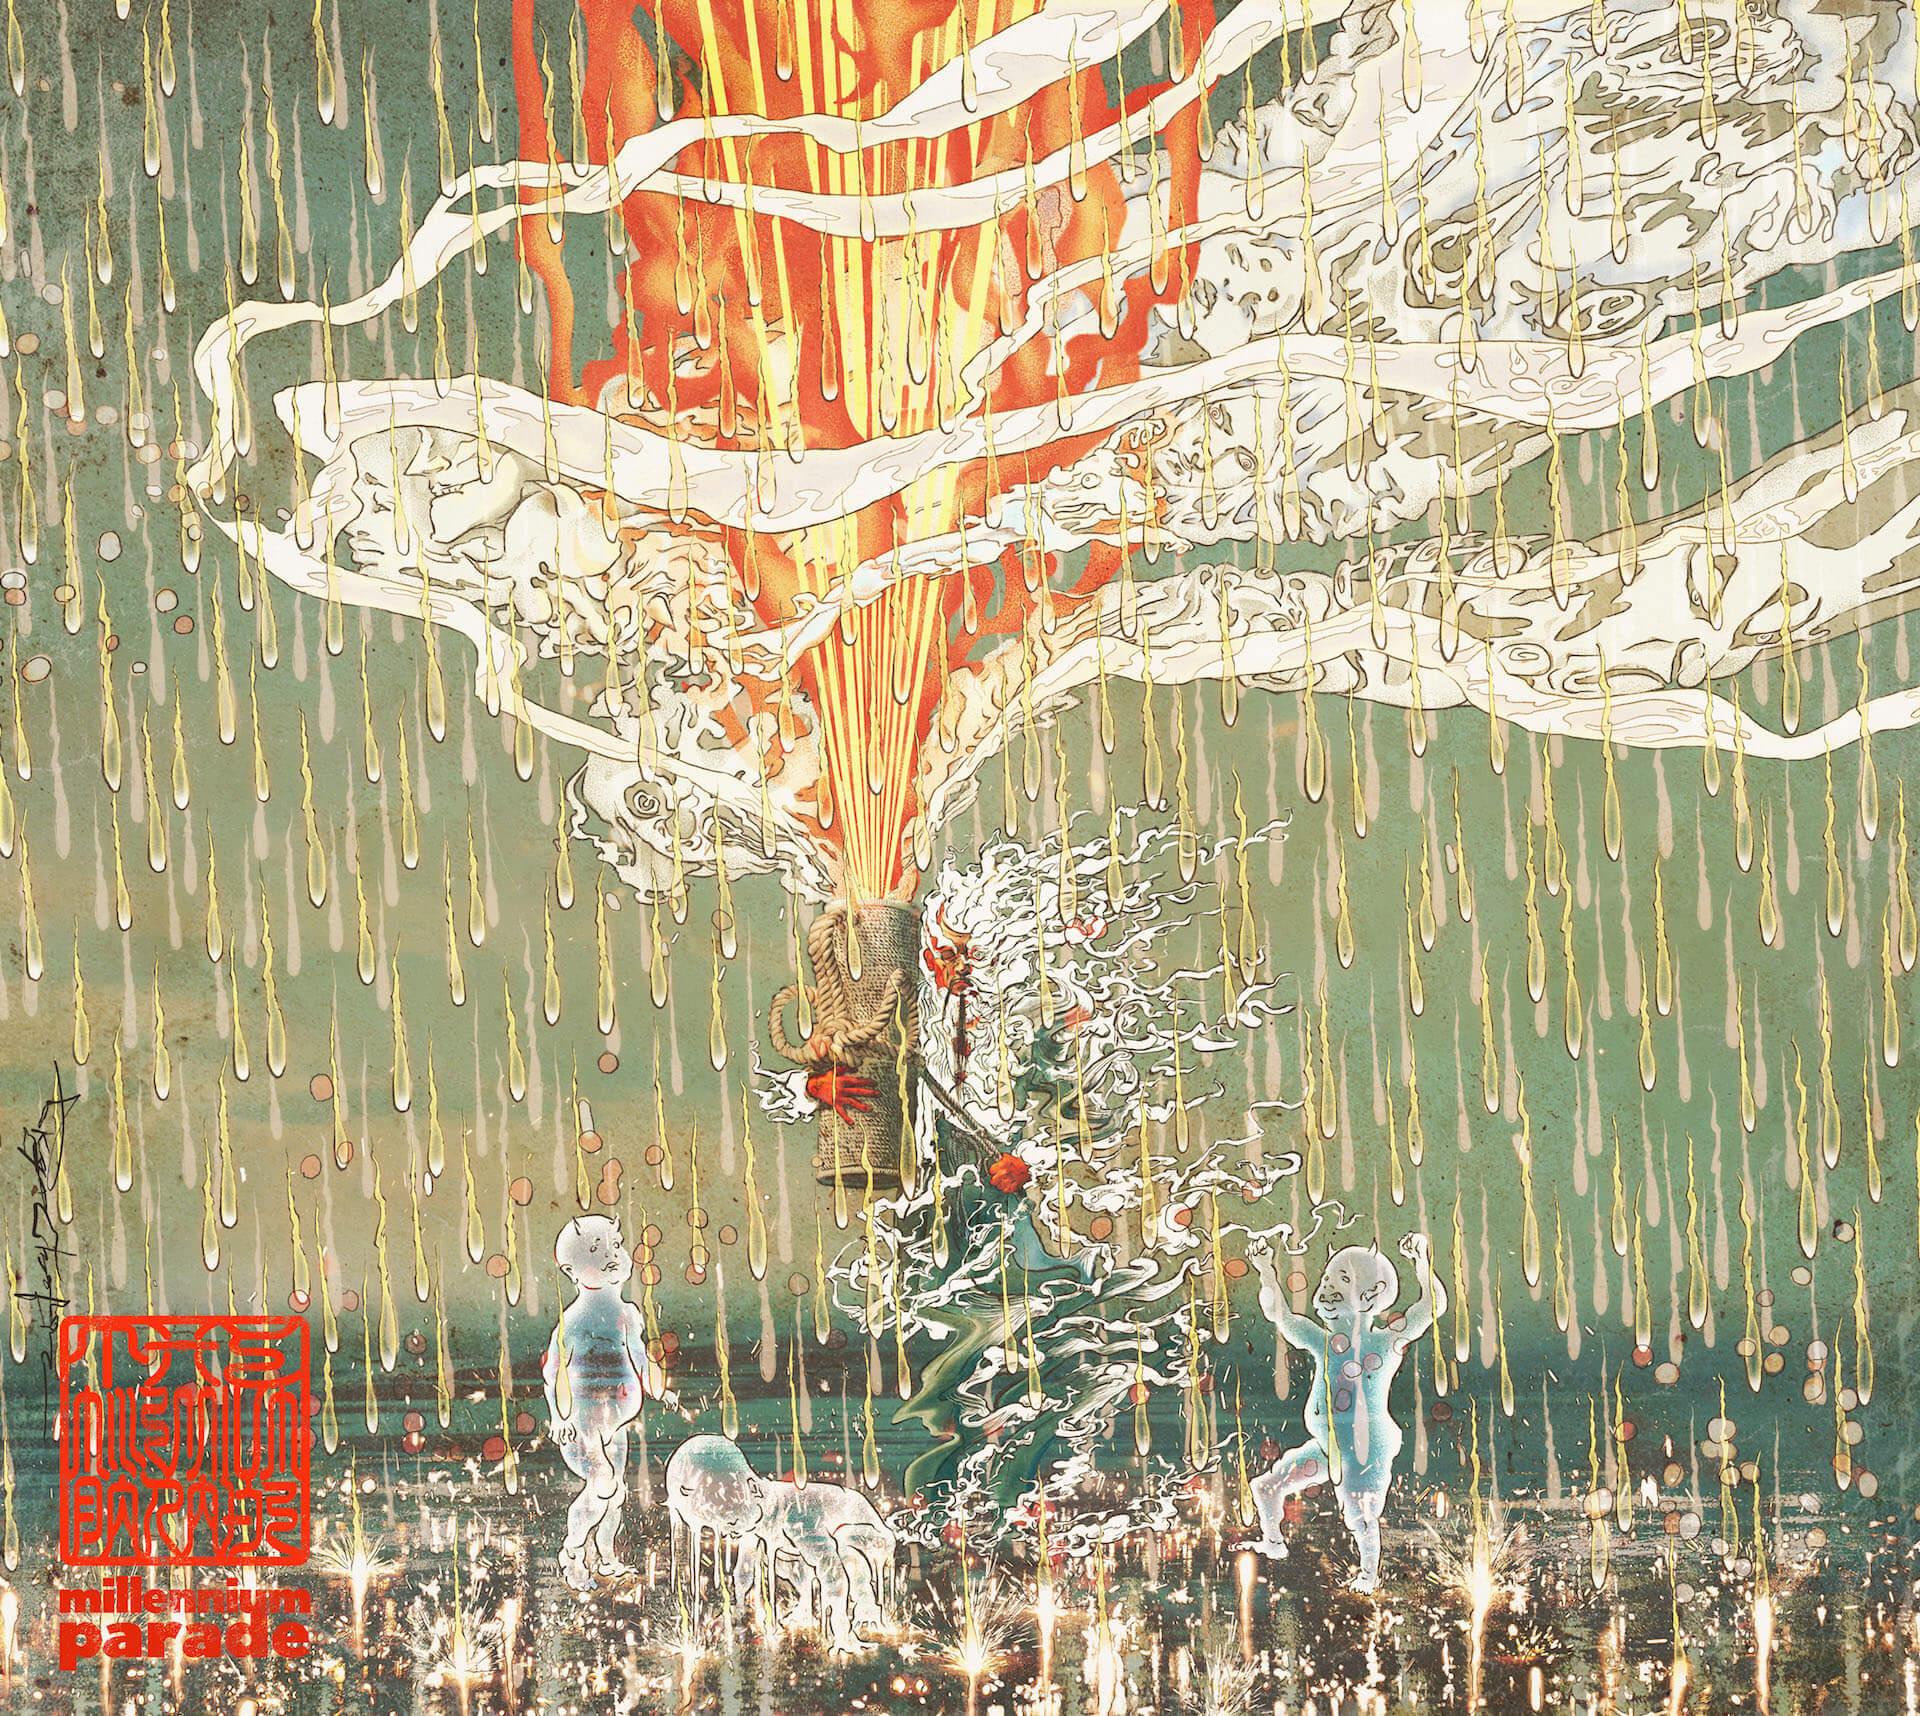 King Gnu常田大希のソロプロジェクト・millennium paradeの1stアルバムがリリース決定!3Dライブの開催も発表 music201125_millenniumparade_2